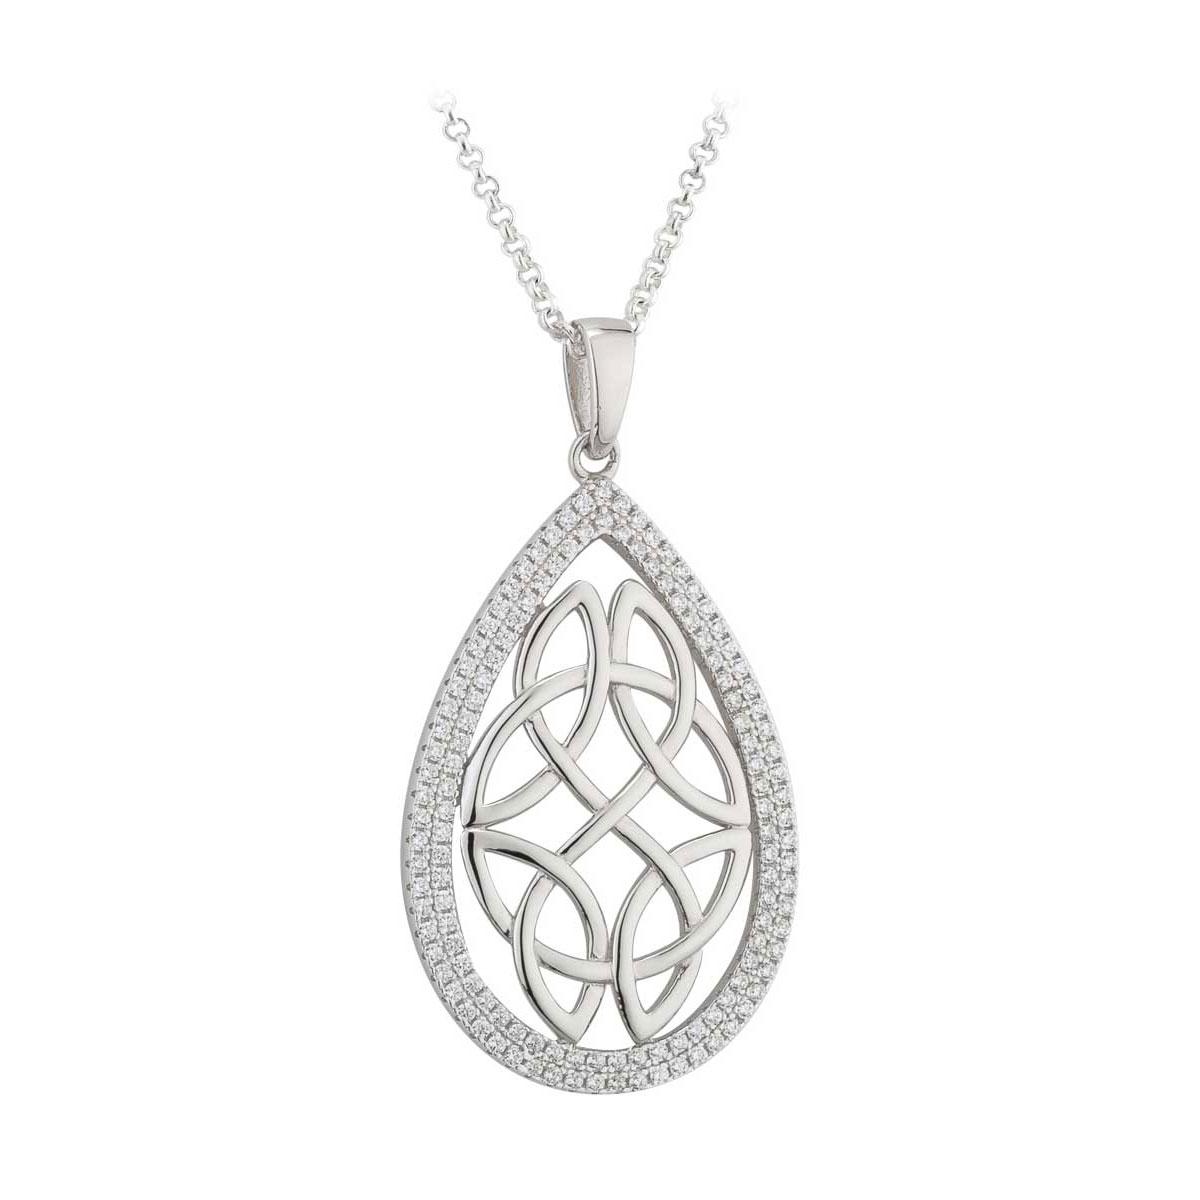 Cashs Ireland, Crystal Pave Sterling Silver Oval Celtic Knot Pendant Necklace